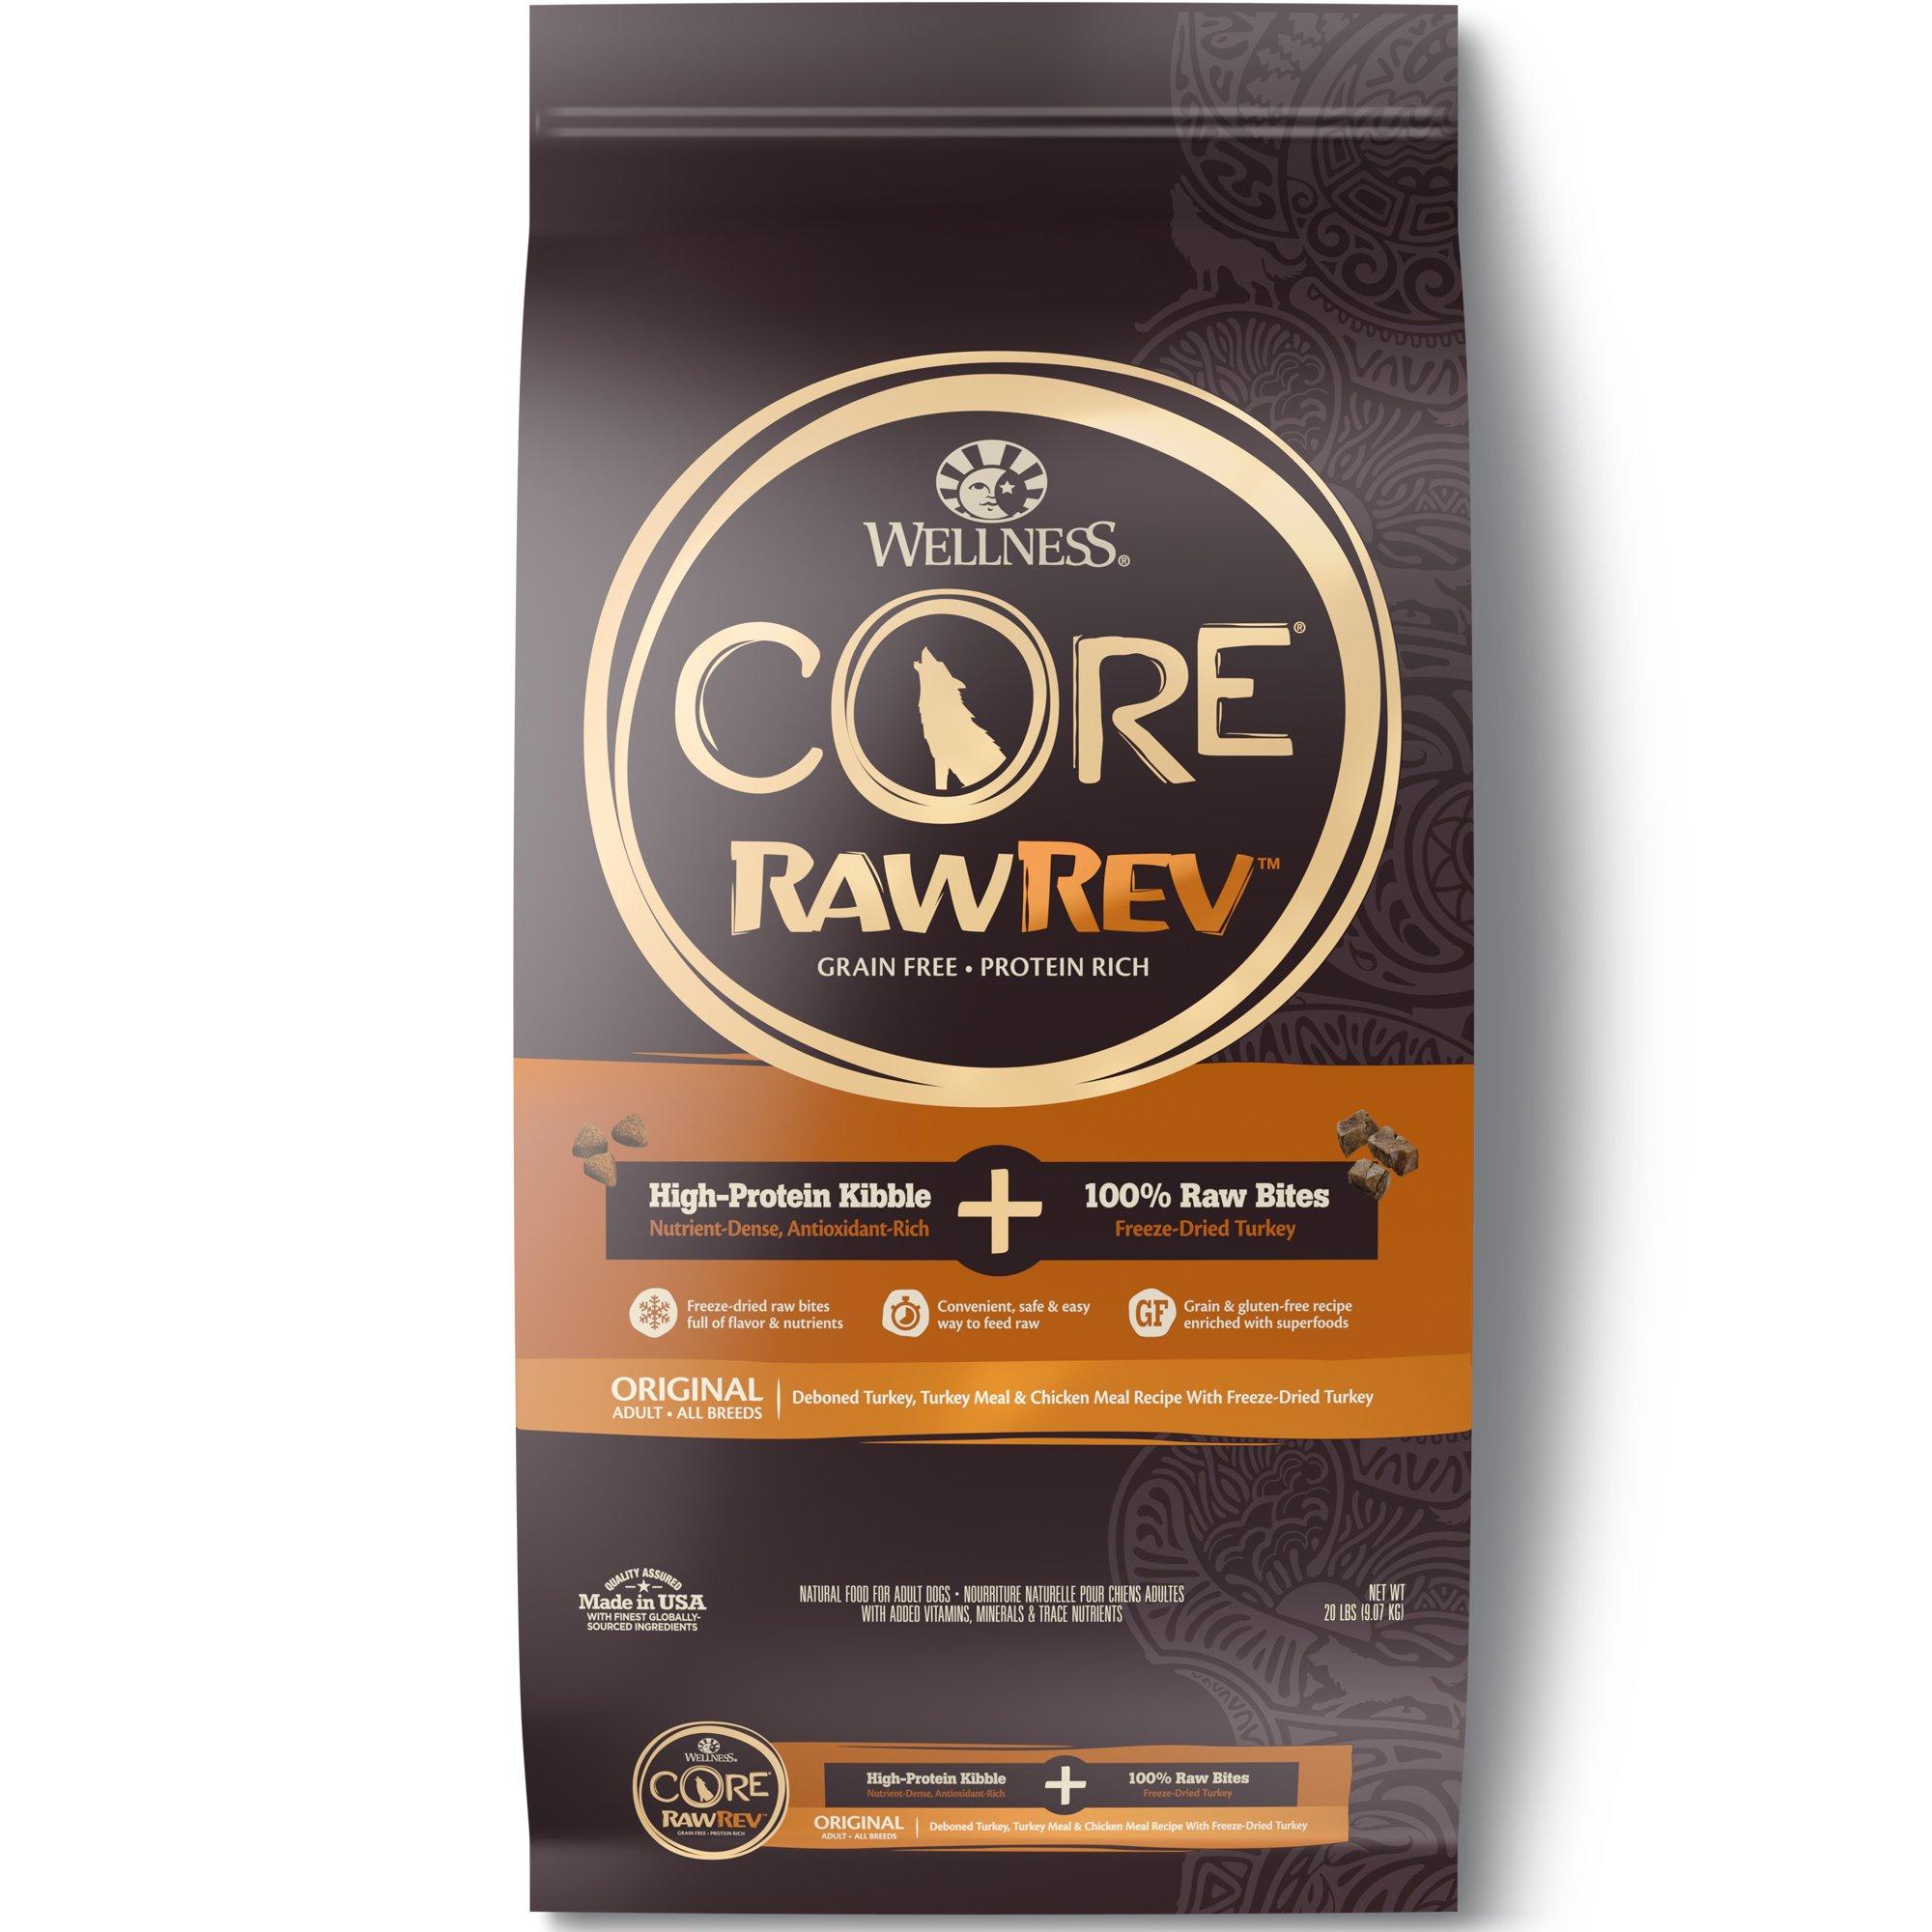 Wellness Core Rawrev Natural Grain Free Dry Dog Food, Original Turkey & Chicken With Freeze Dried Turkey, 20-Pound Bag